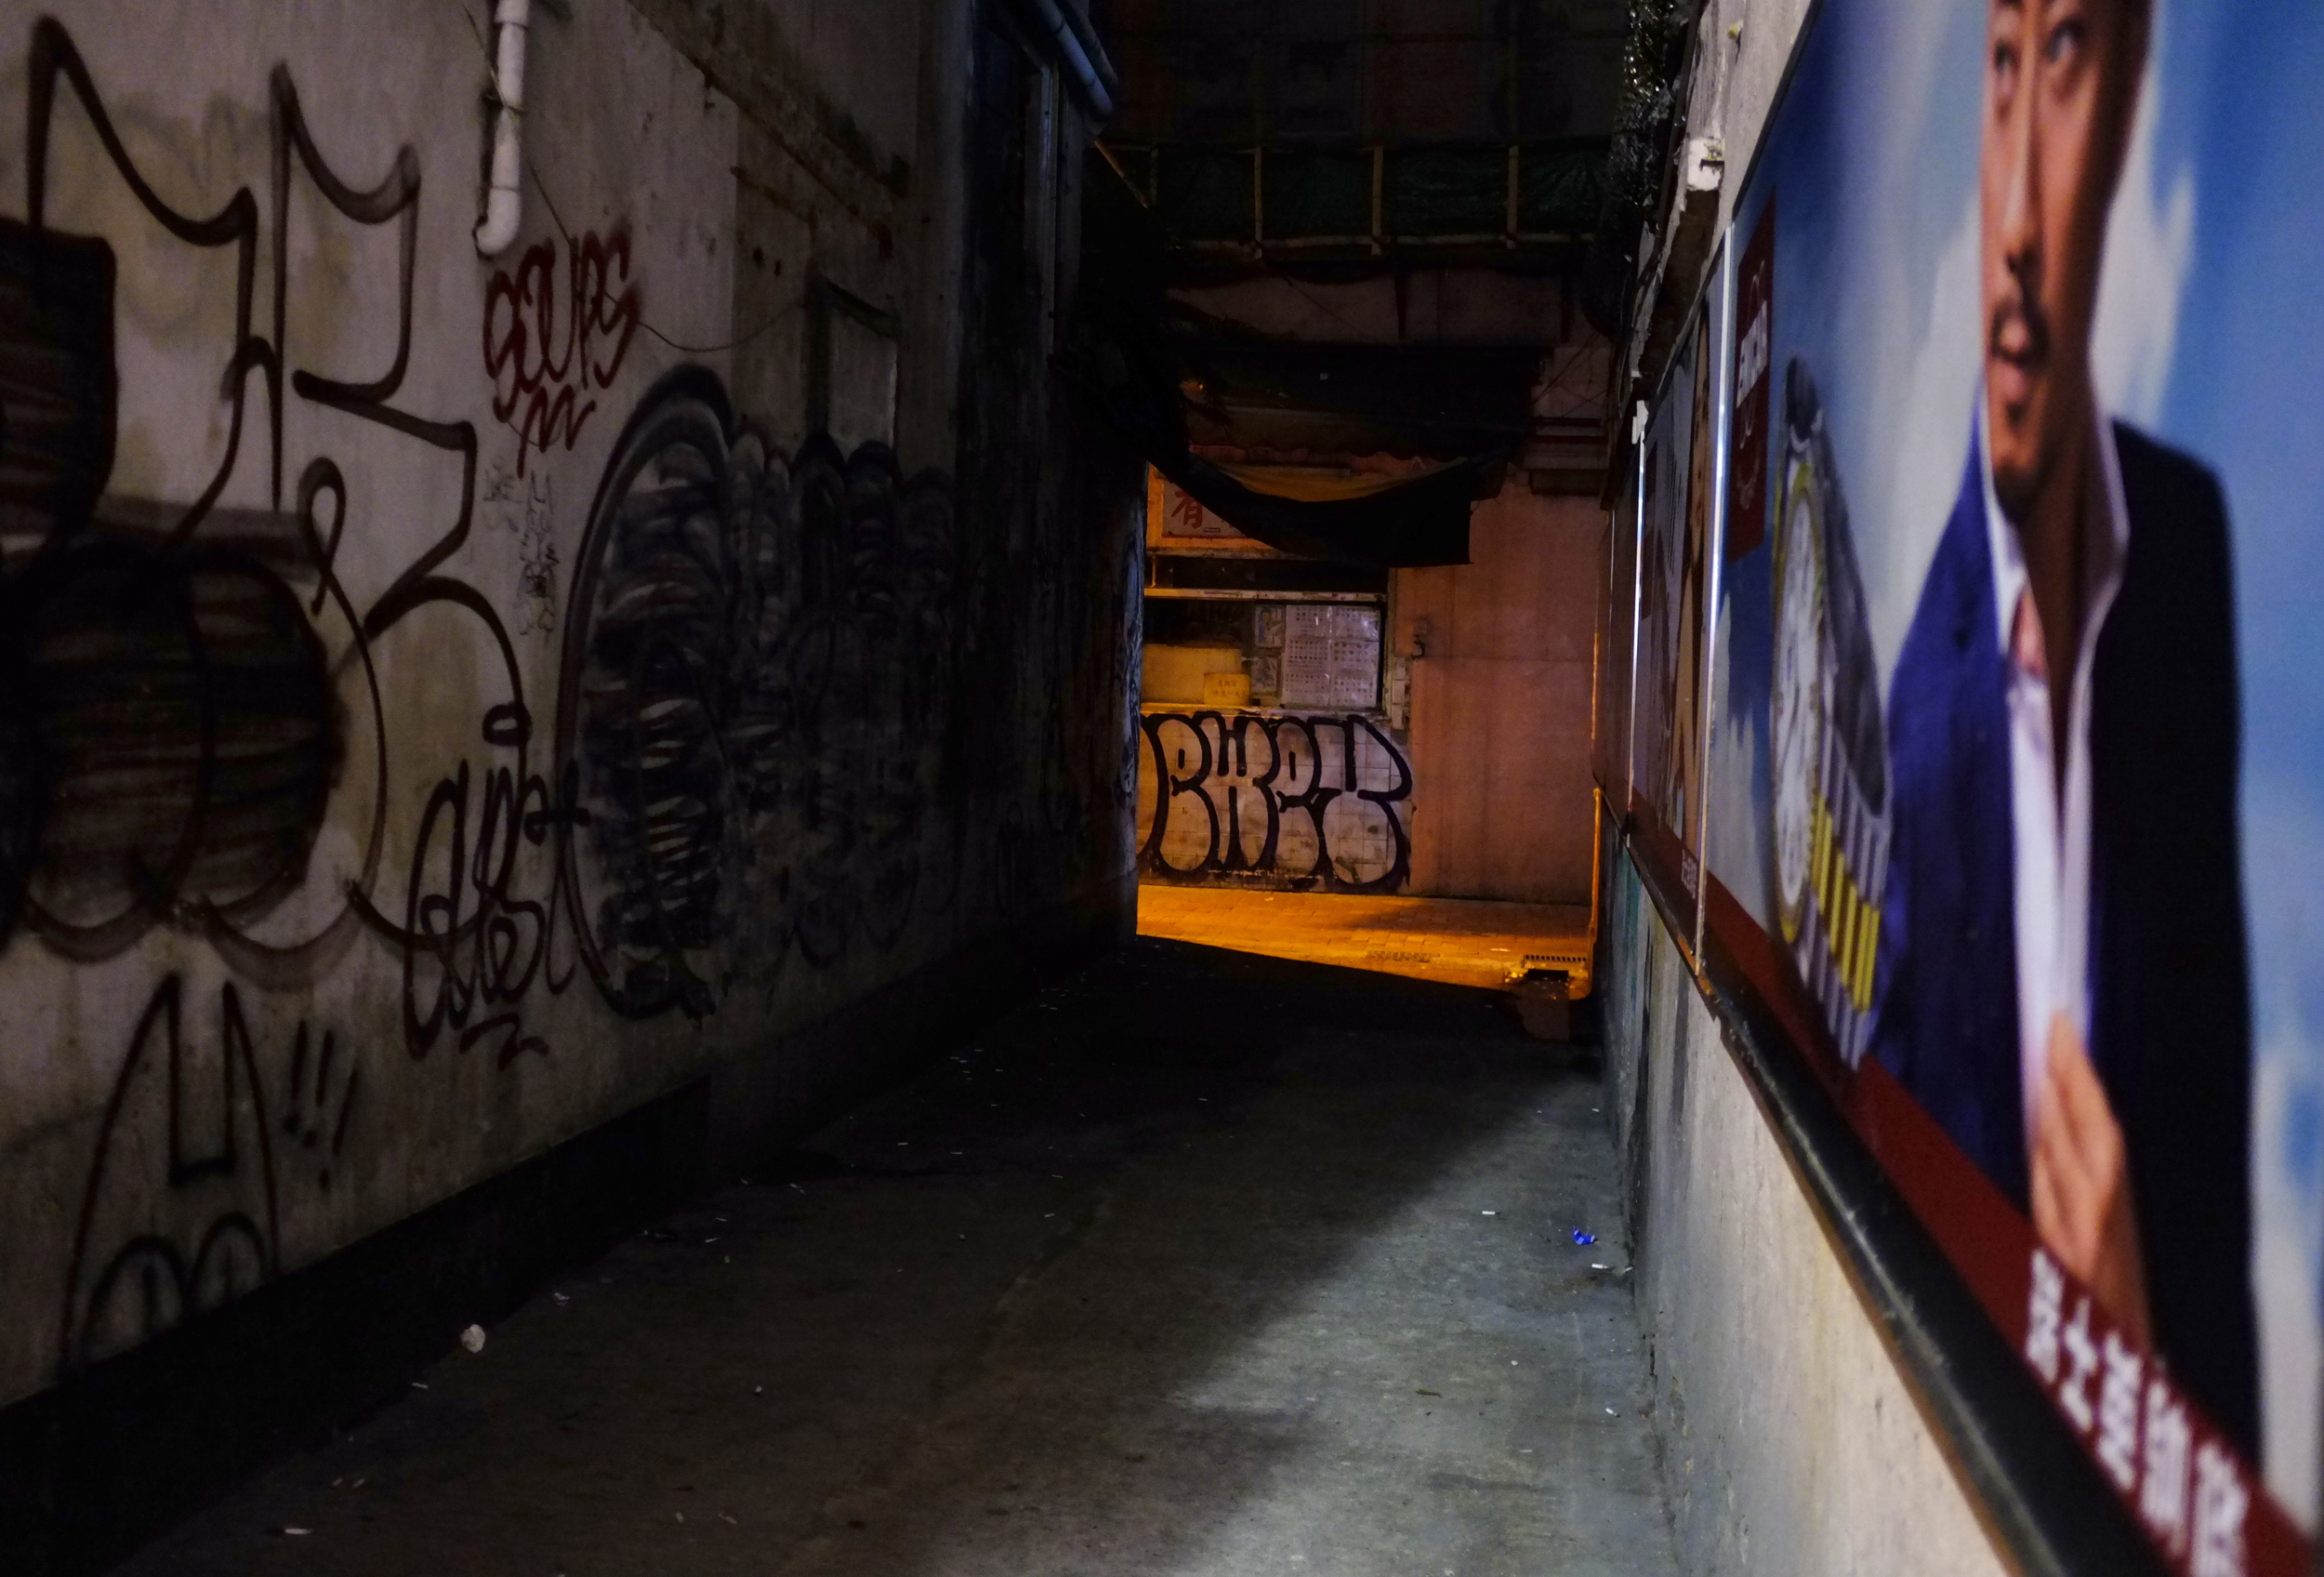 Alley in Causeway Bay